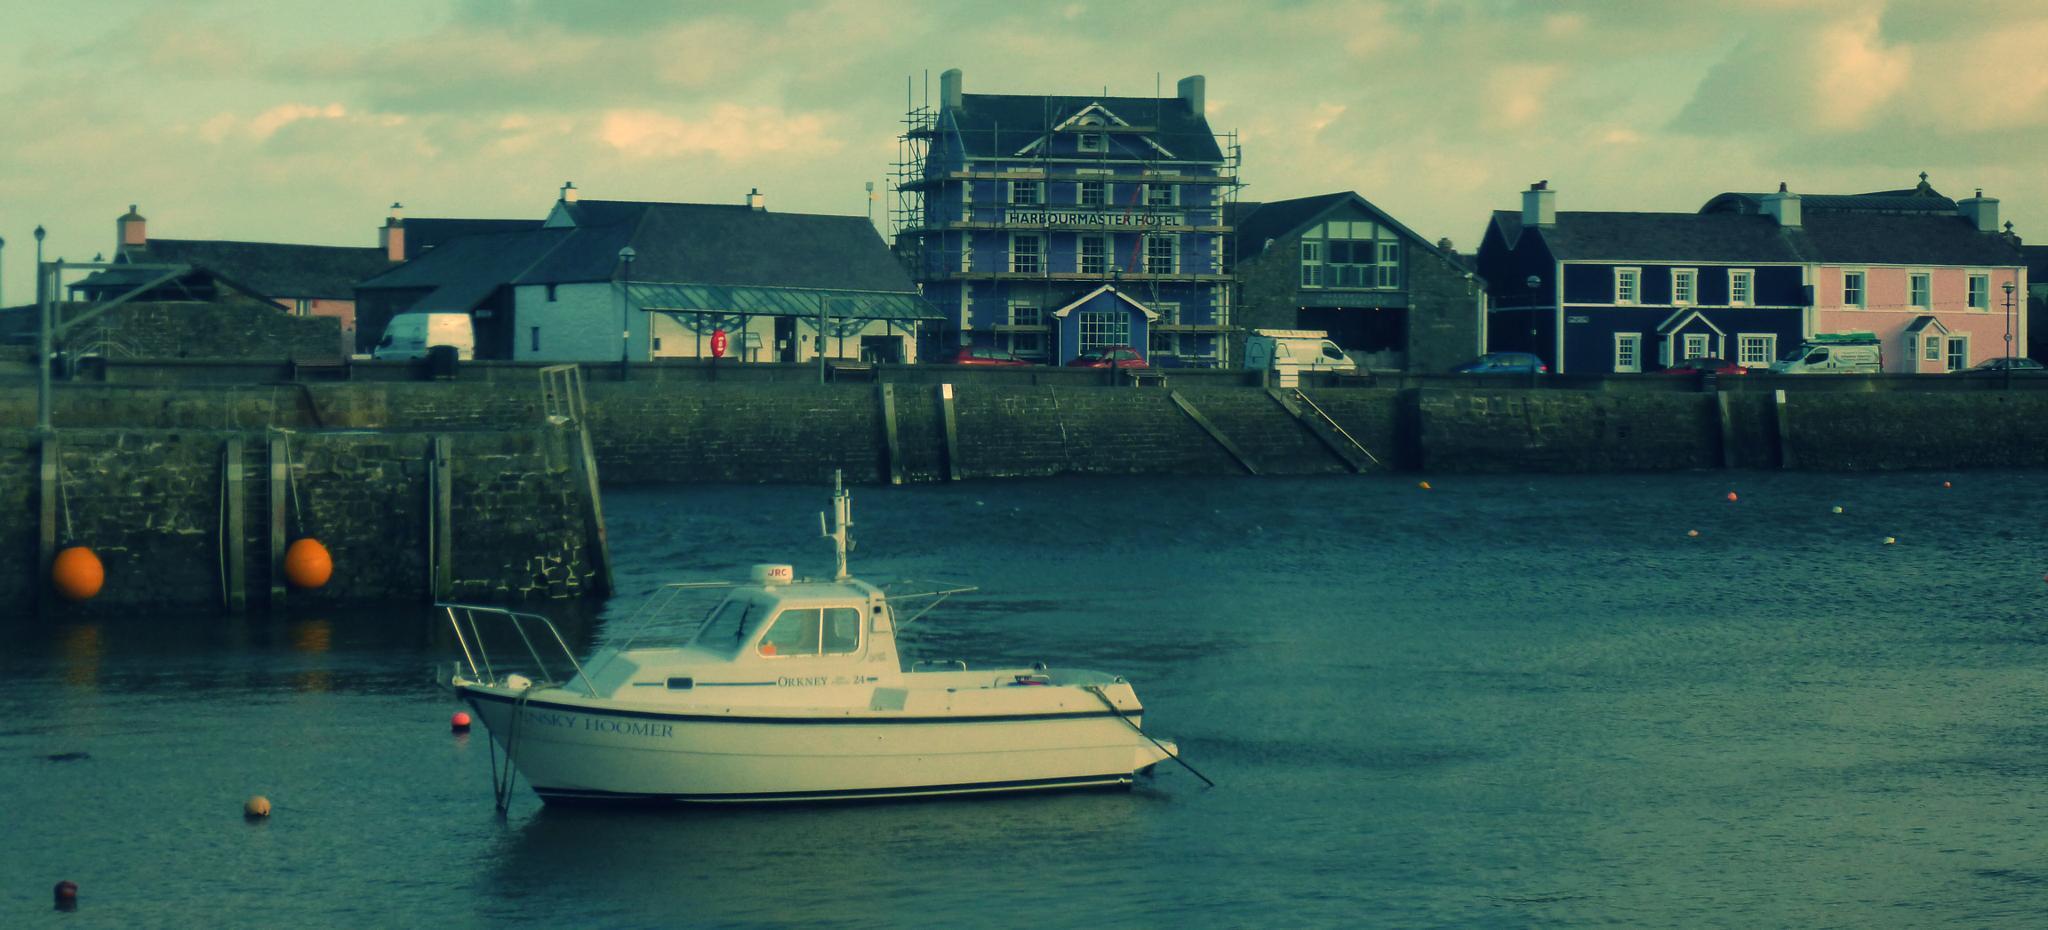 aberaeron harbour by chris.adams.3557